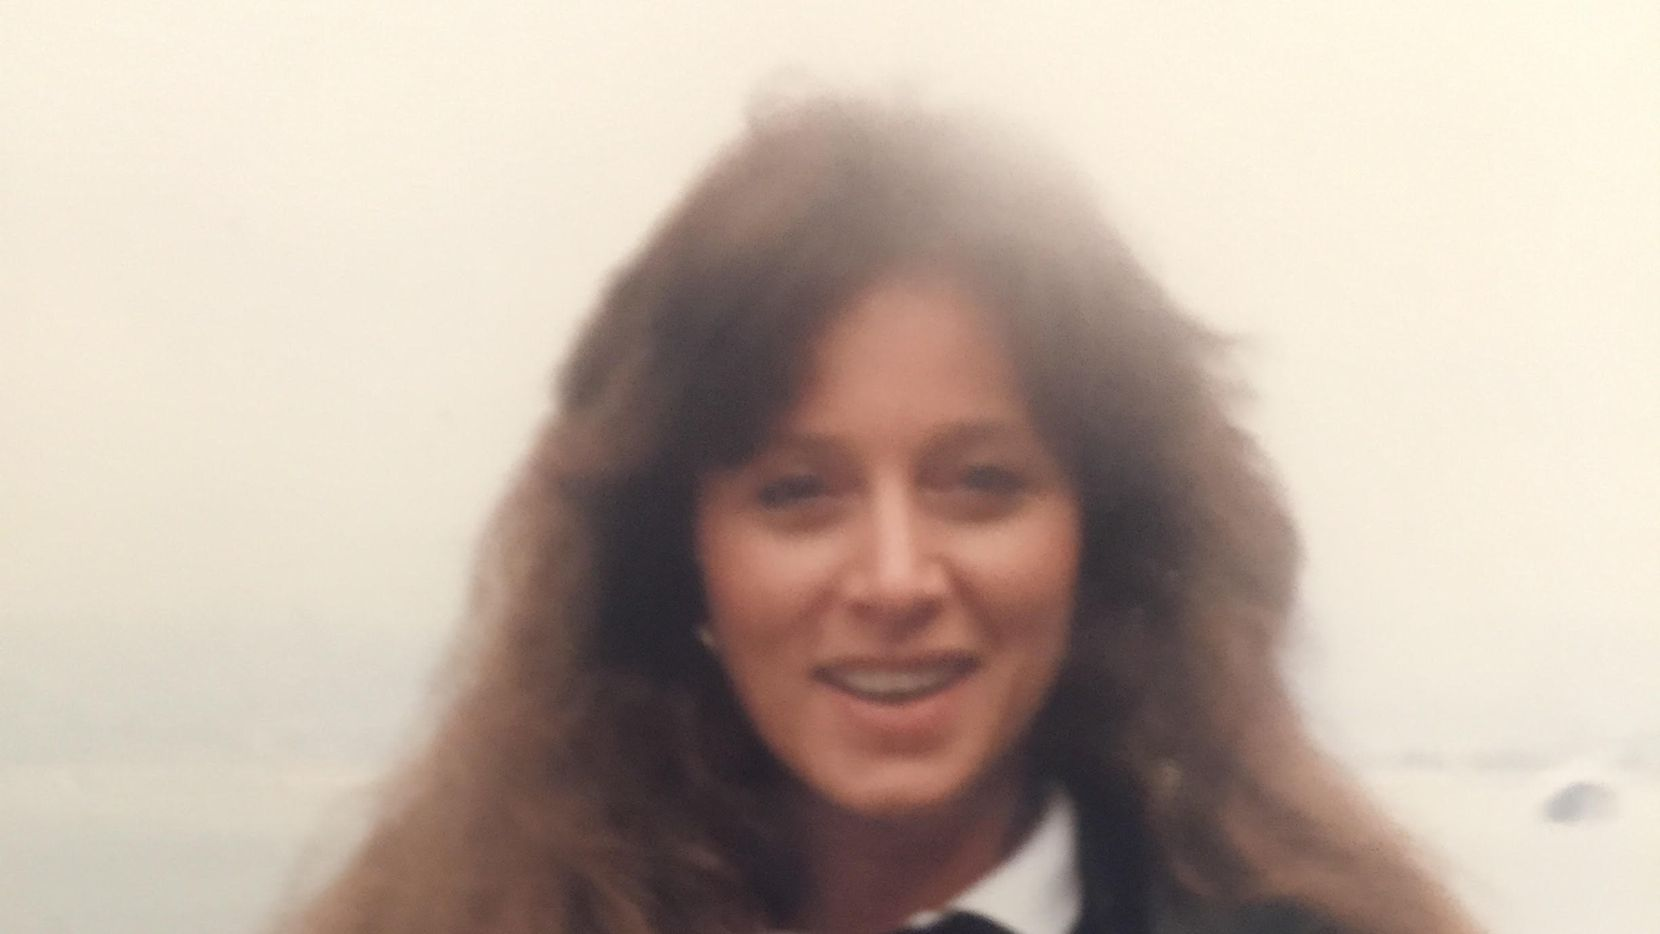 San Francisco Giants fan Lori Cowlishaw in 1988.